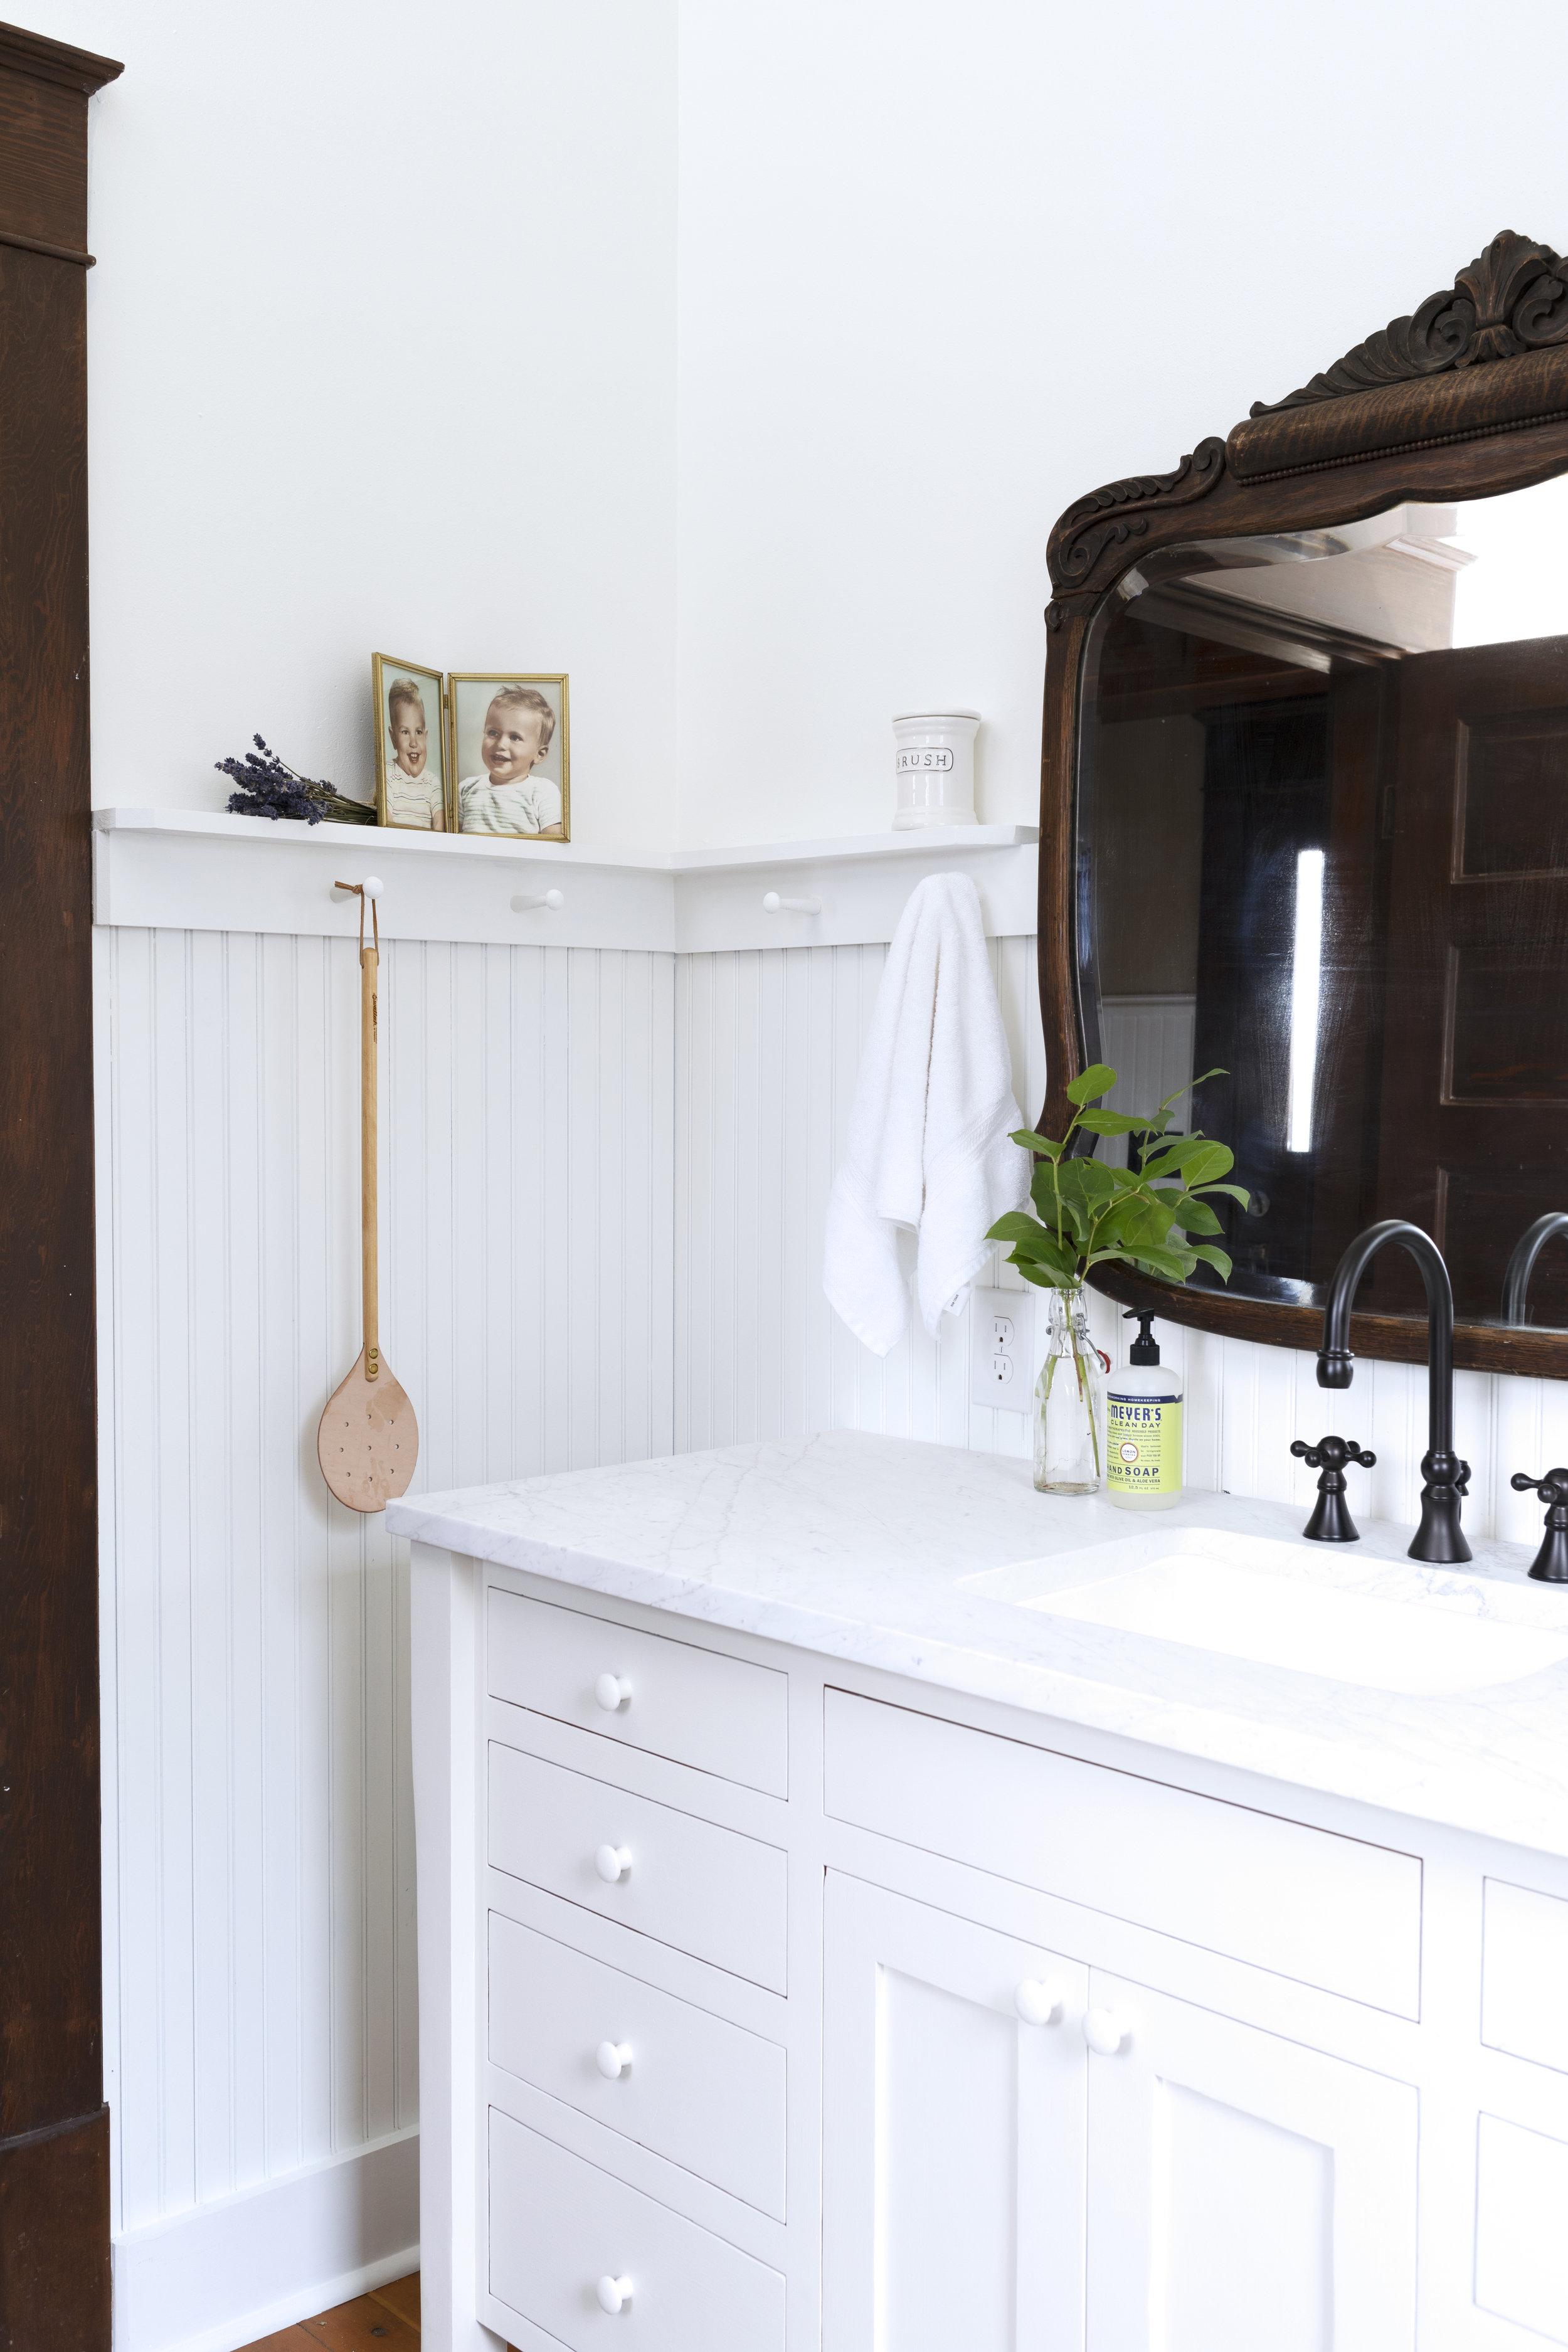 The Grit and Polish - Farmhouse Bathroom Budget Refresh Corner Baby Pic.jpg